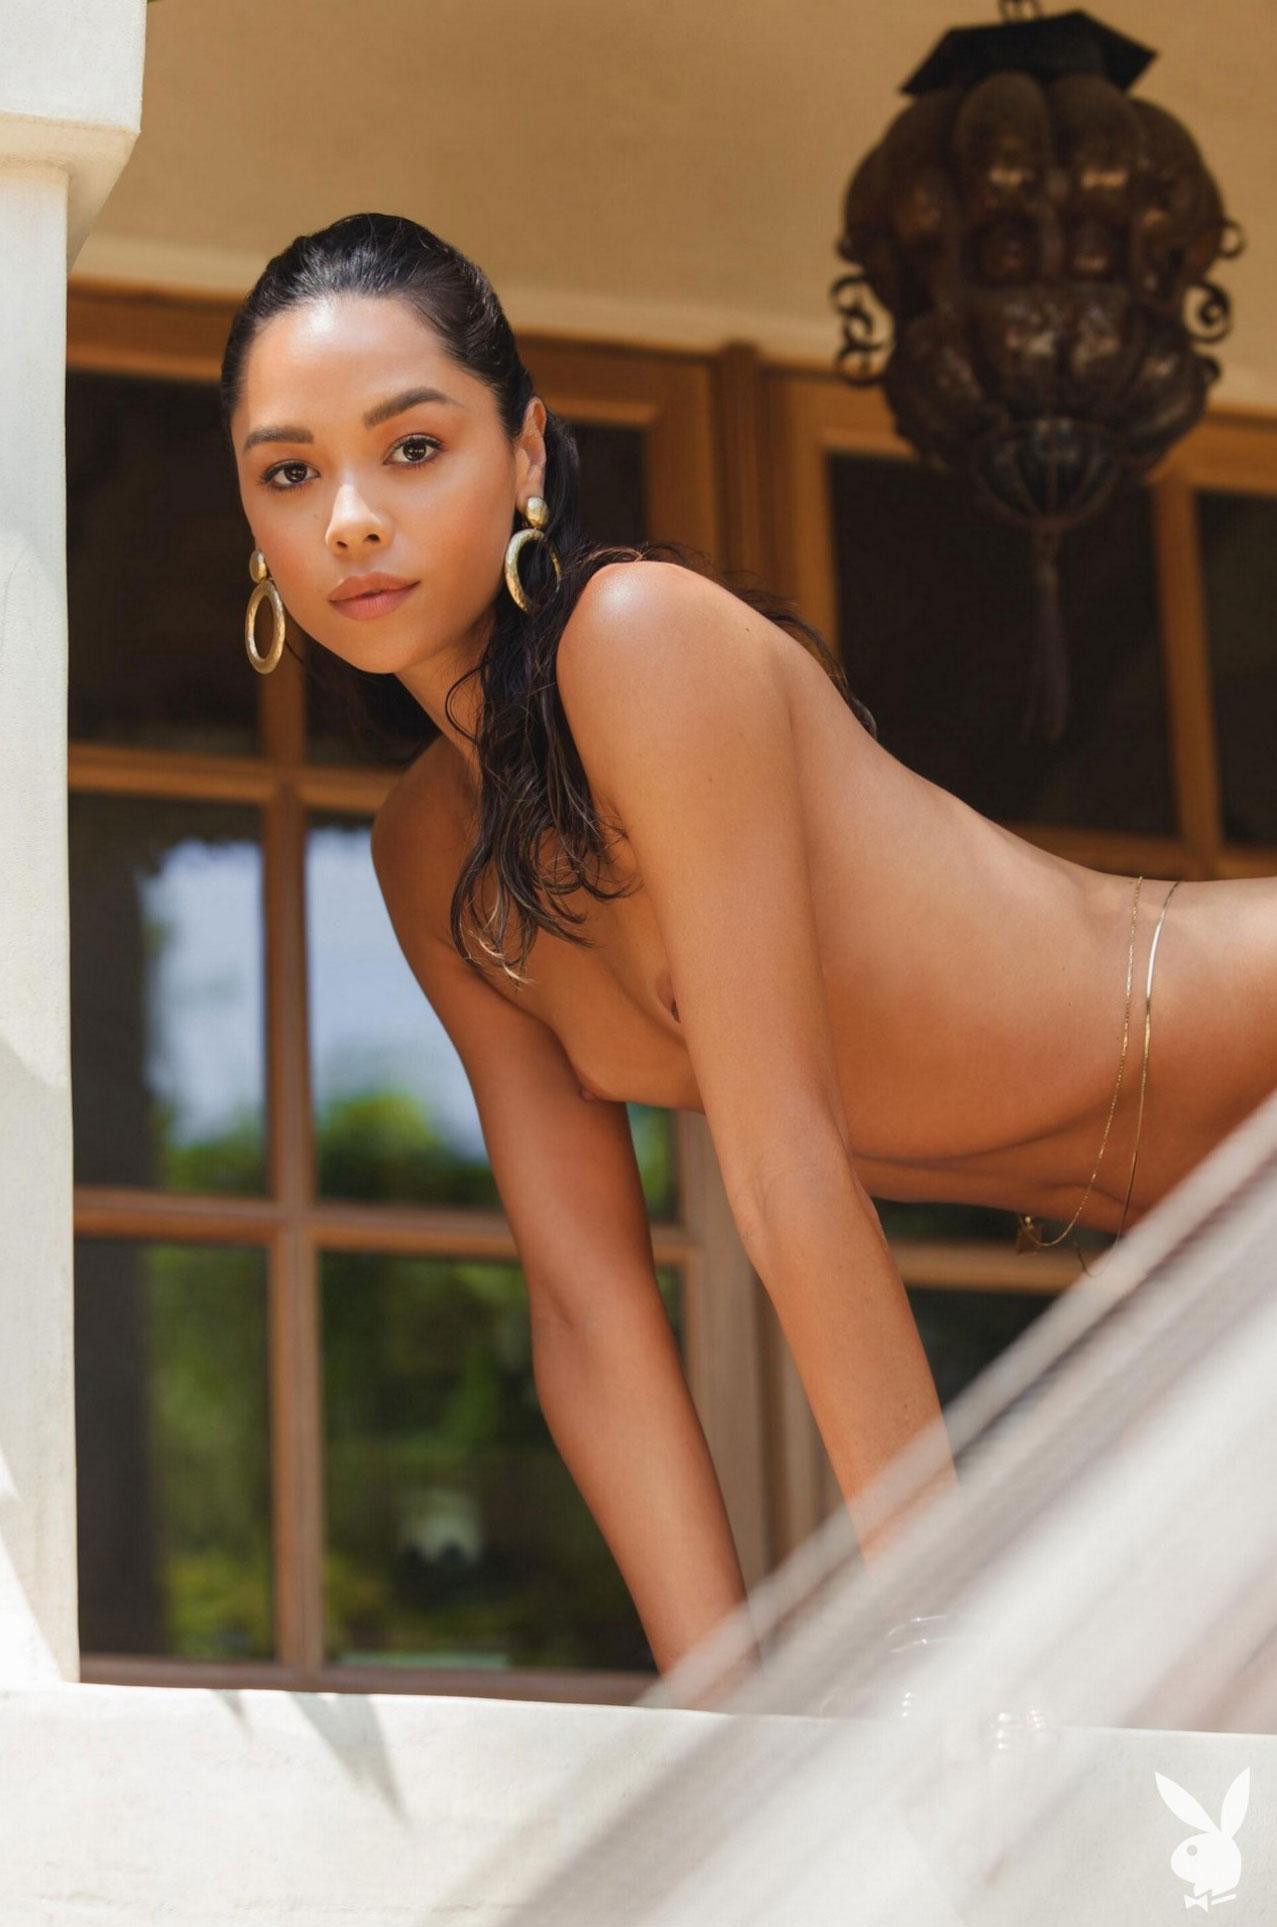 Девушка месяца Даниэлла Алькараз, Playboy США сентябрь 2020 / фото 07